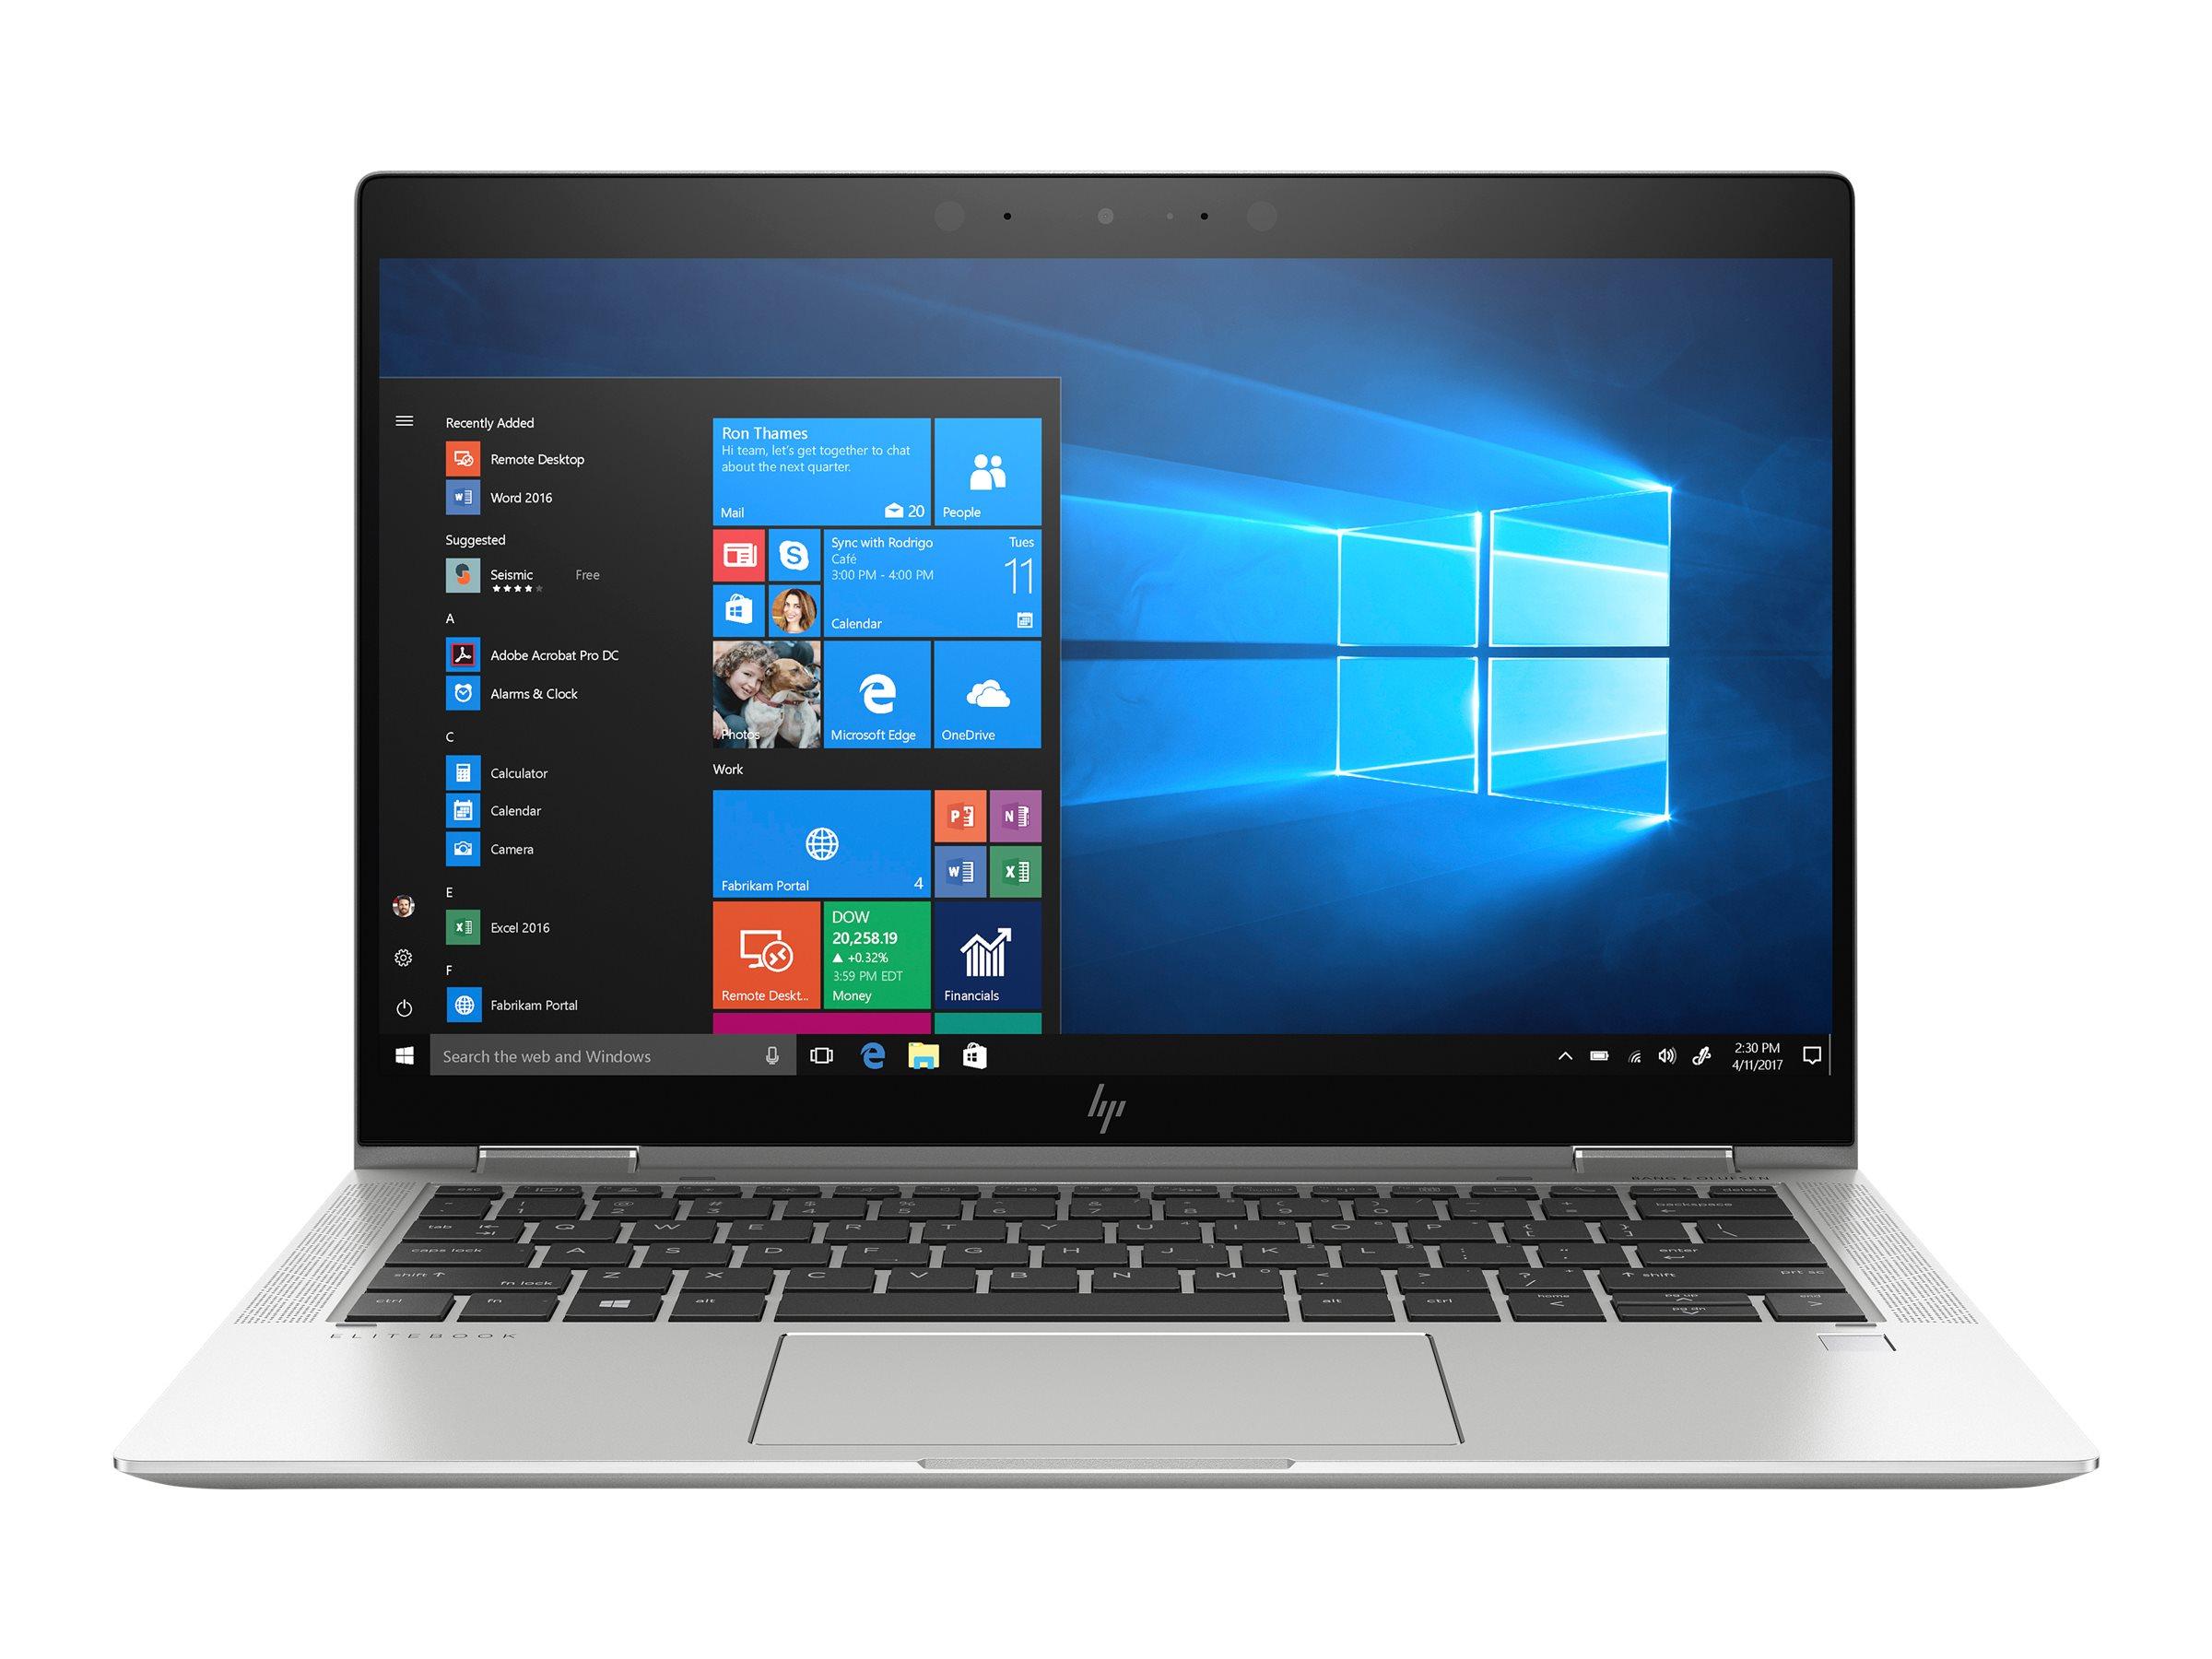 Hp elitebook x360 1030 g4 flip design core i5 8265u 1 6 ghz win 10 pro 64 bit 8 gb ram 256 gb ssd nvme 11843940 7yl45ea abd